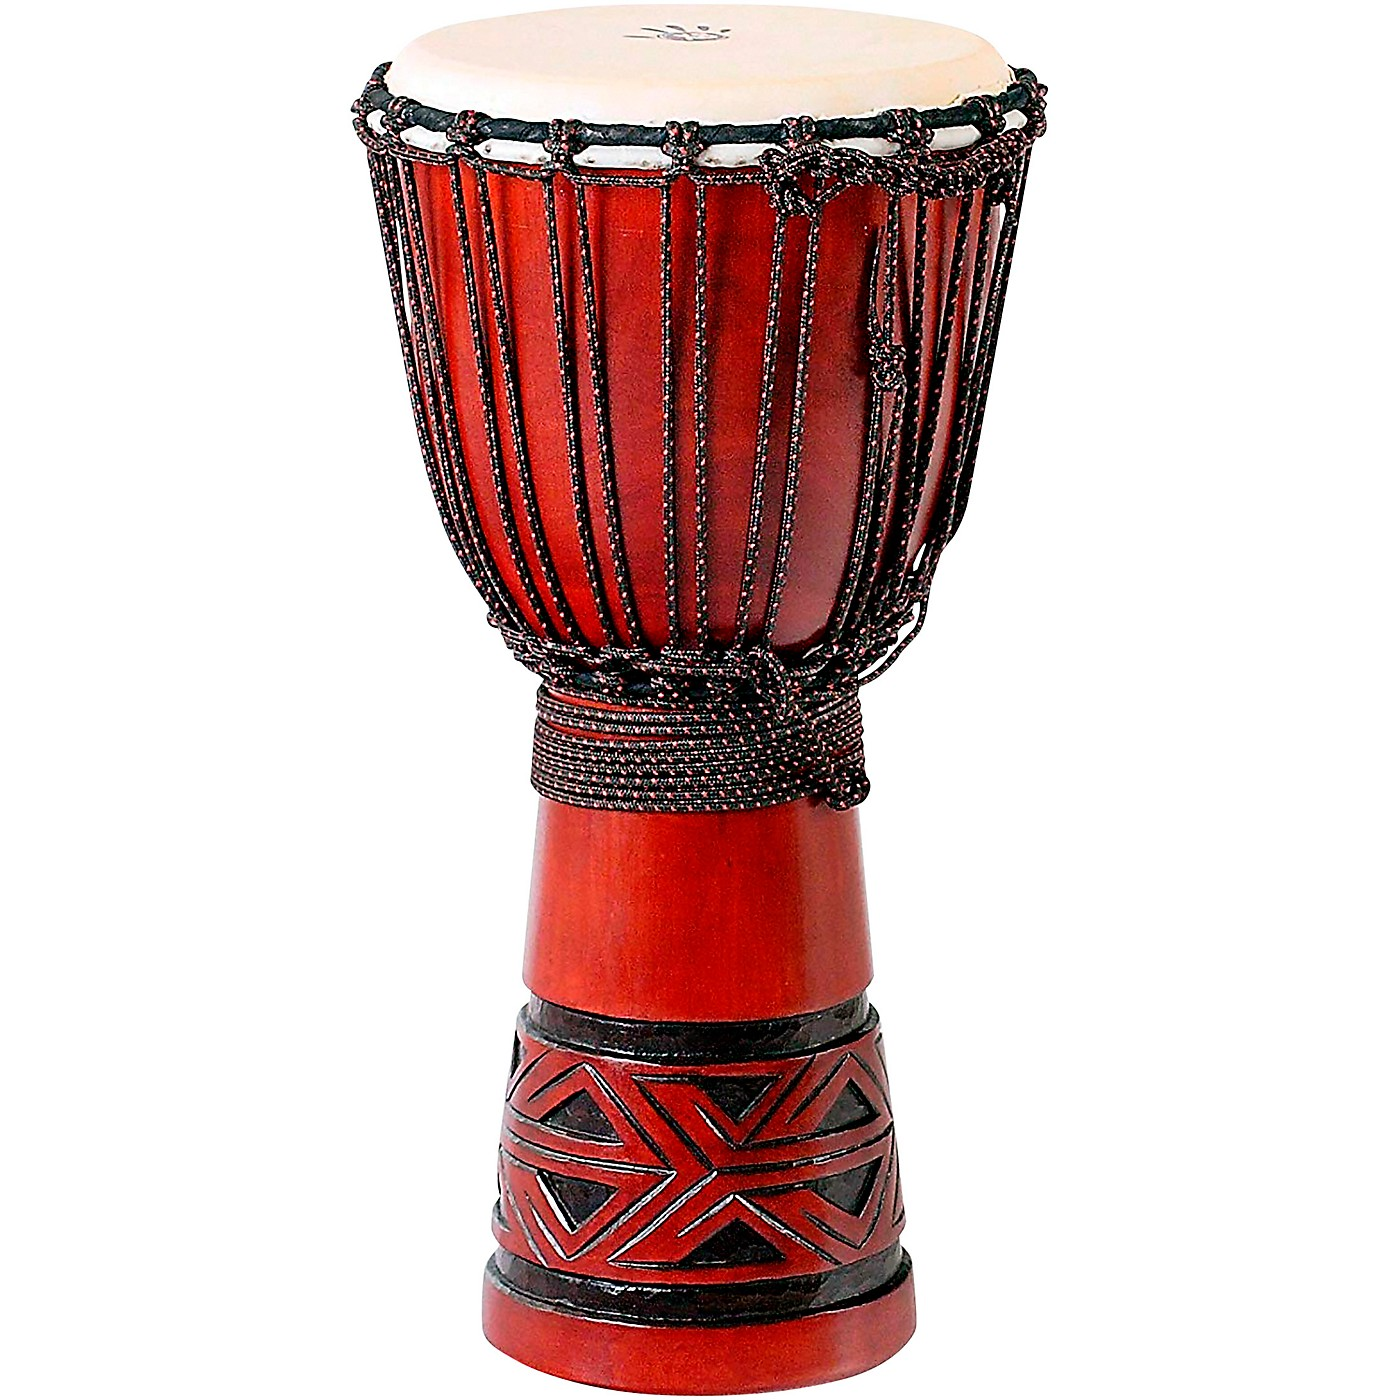 X8 Drums Celtic Labyrinth Djembe Drum thumbnail